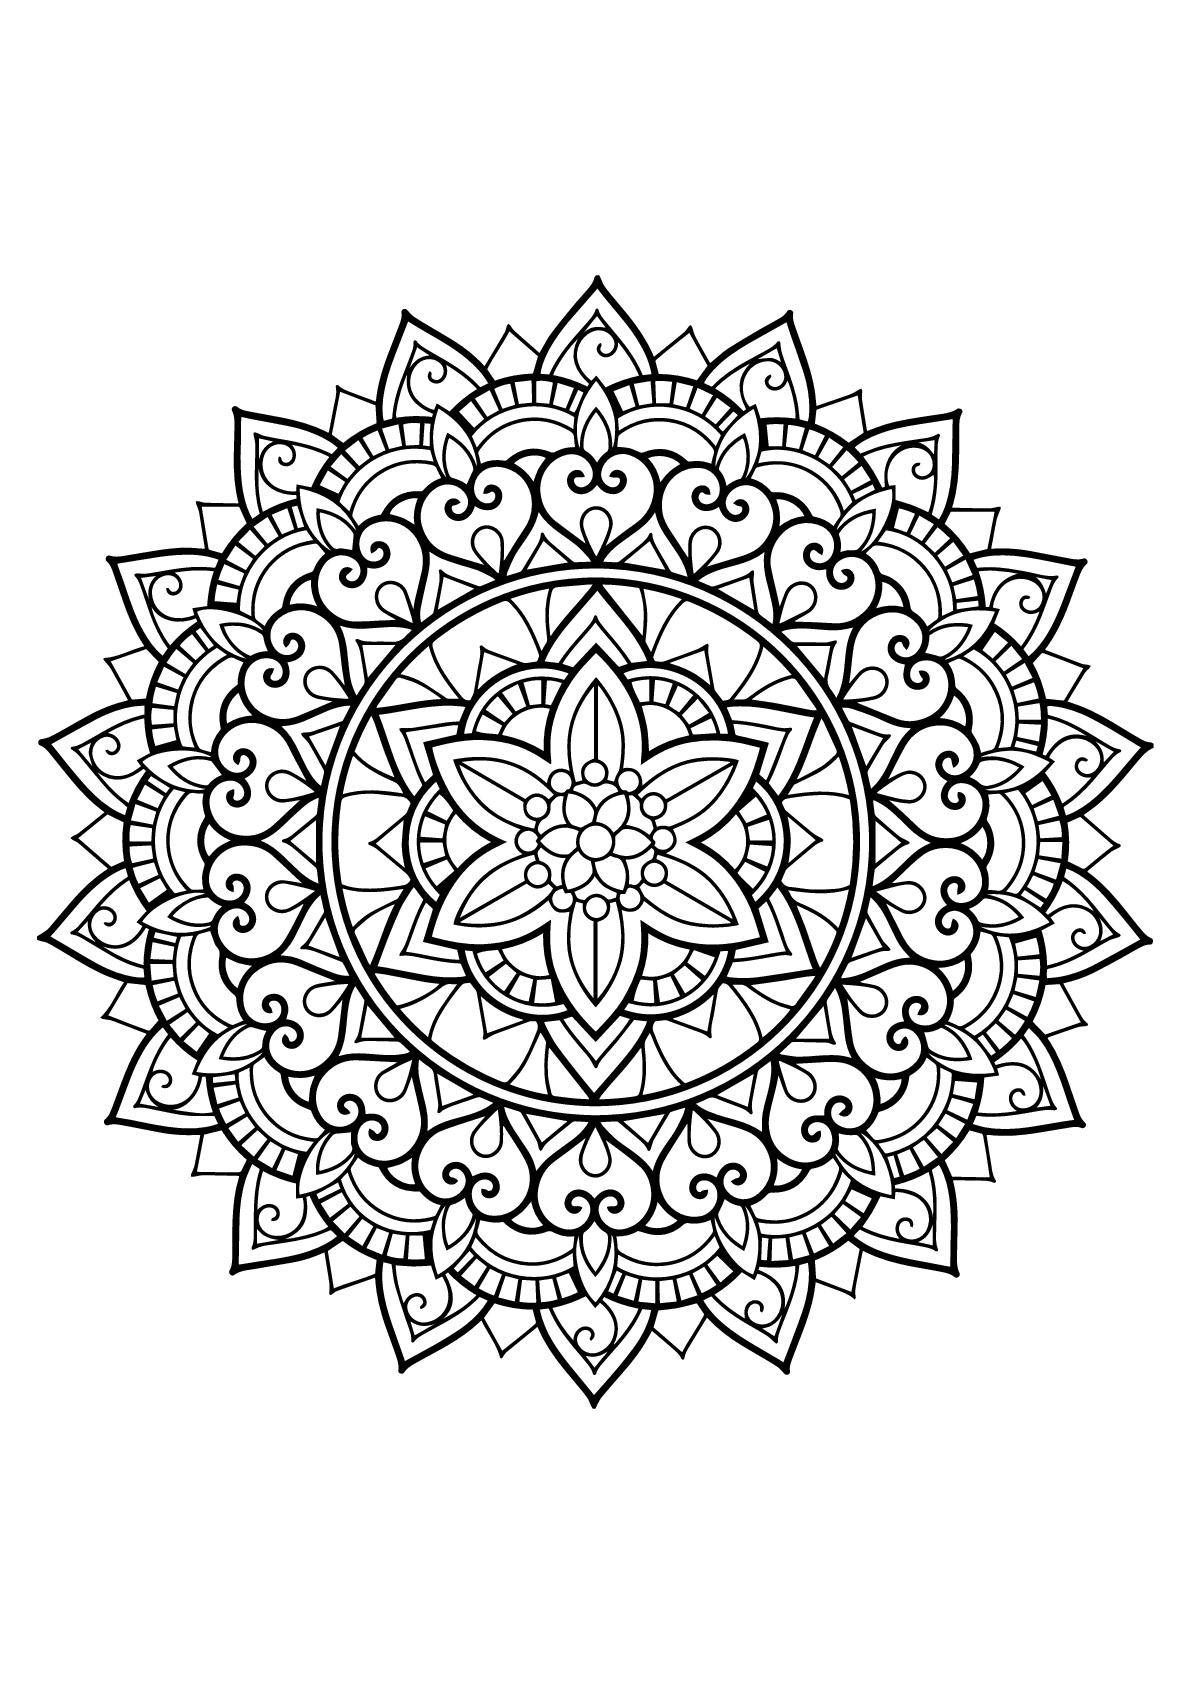 Colorear para adultos  : Mandalas - 29